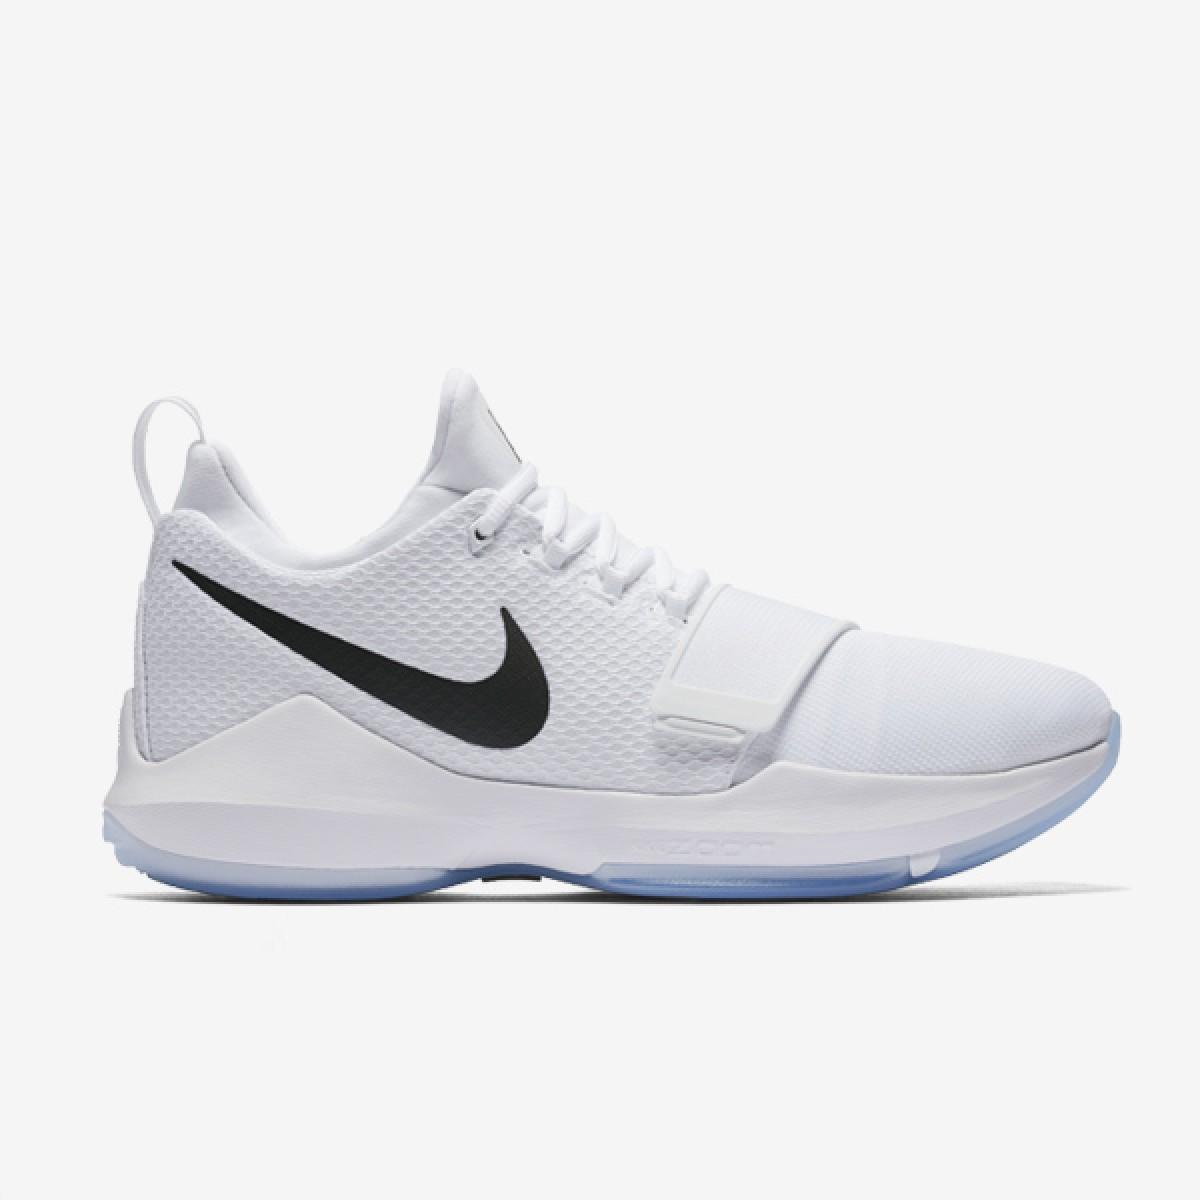 Nike PG 1 'White Ice'